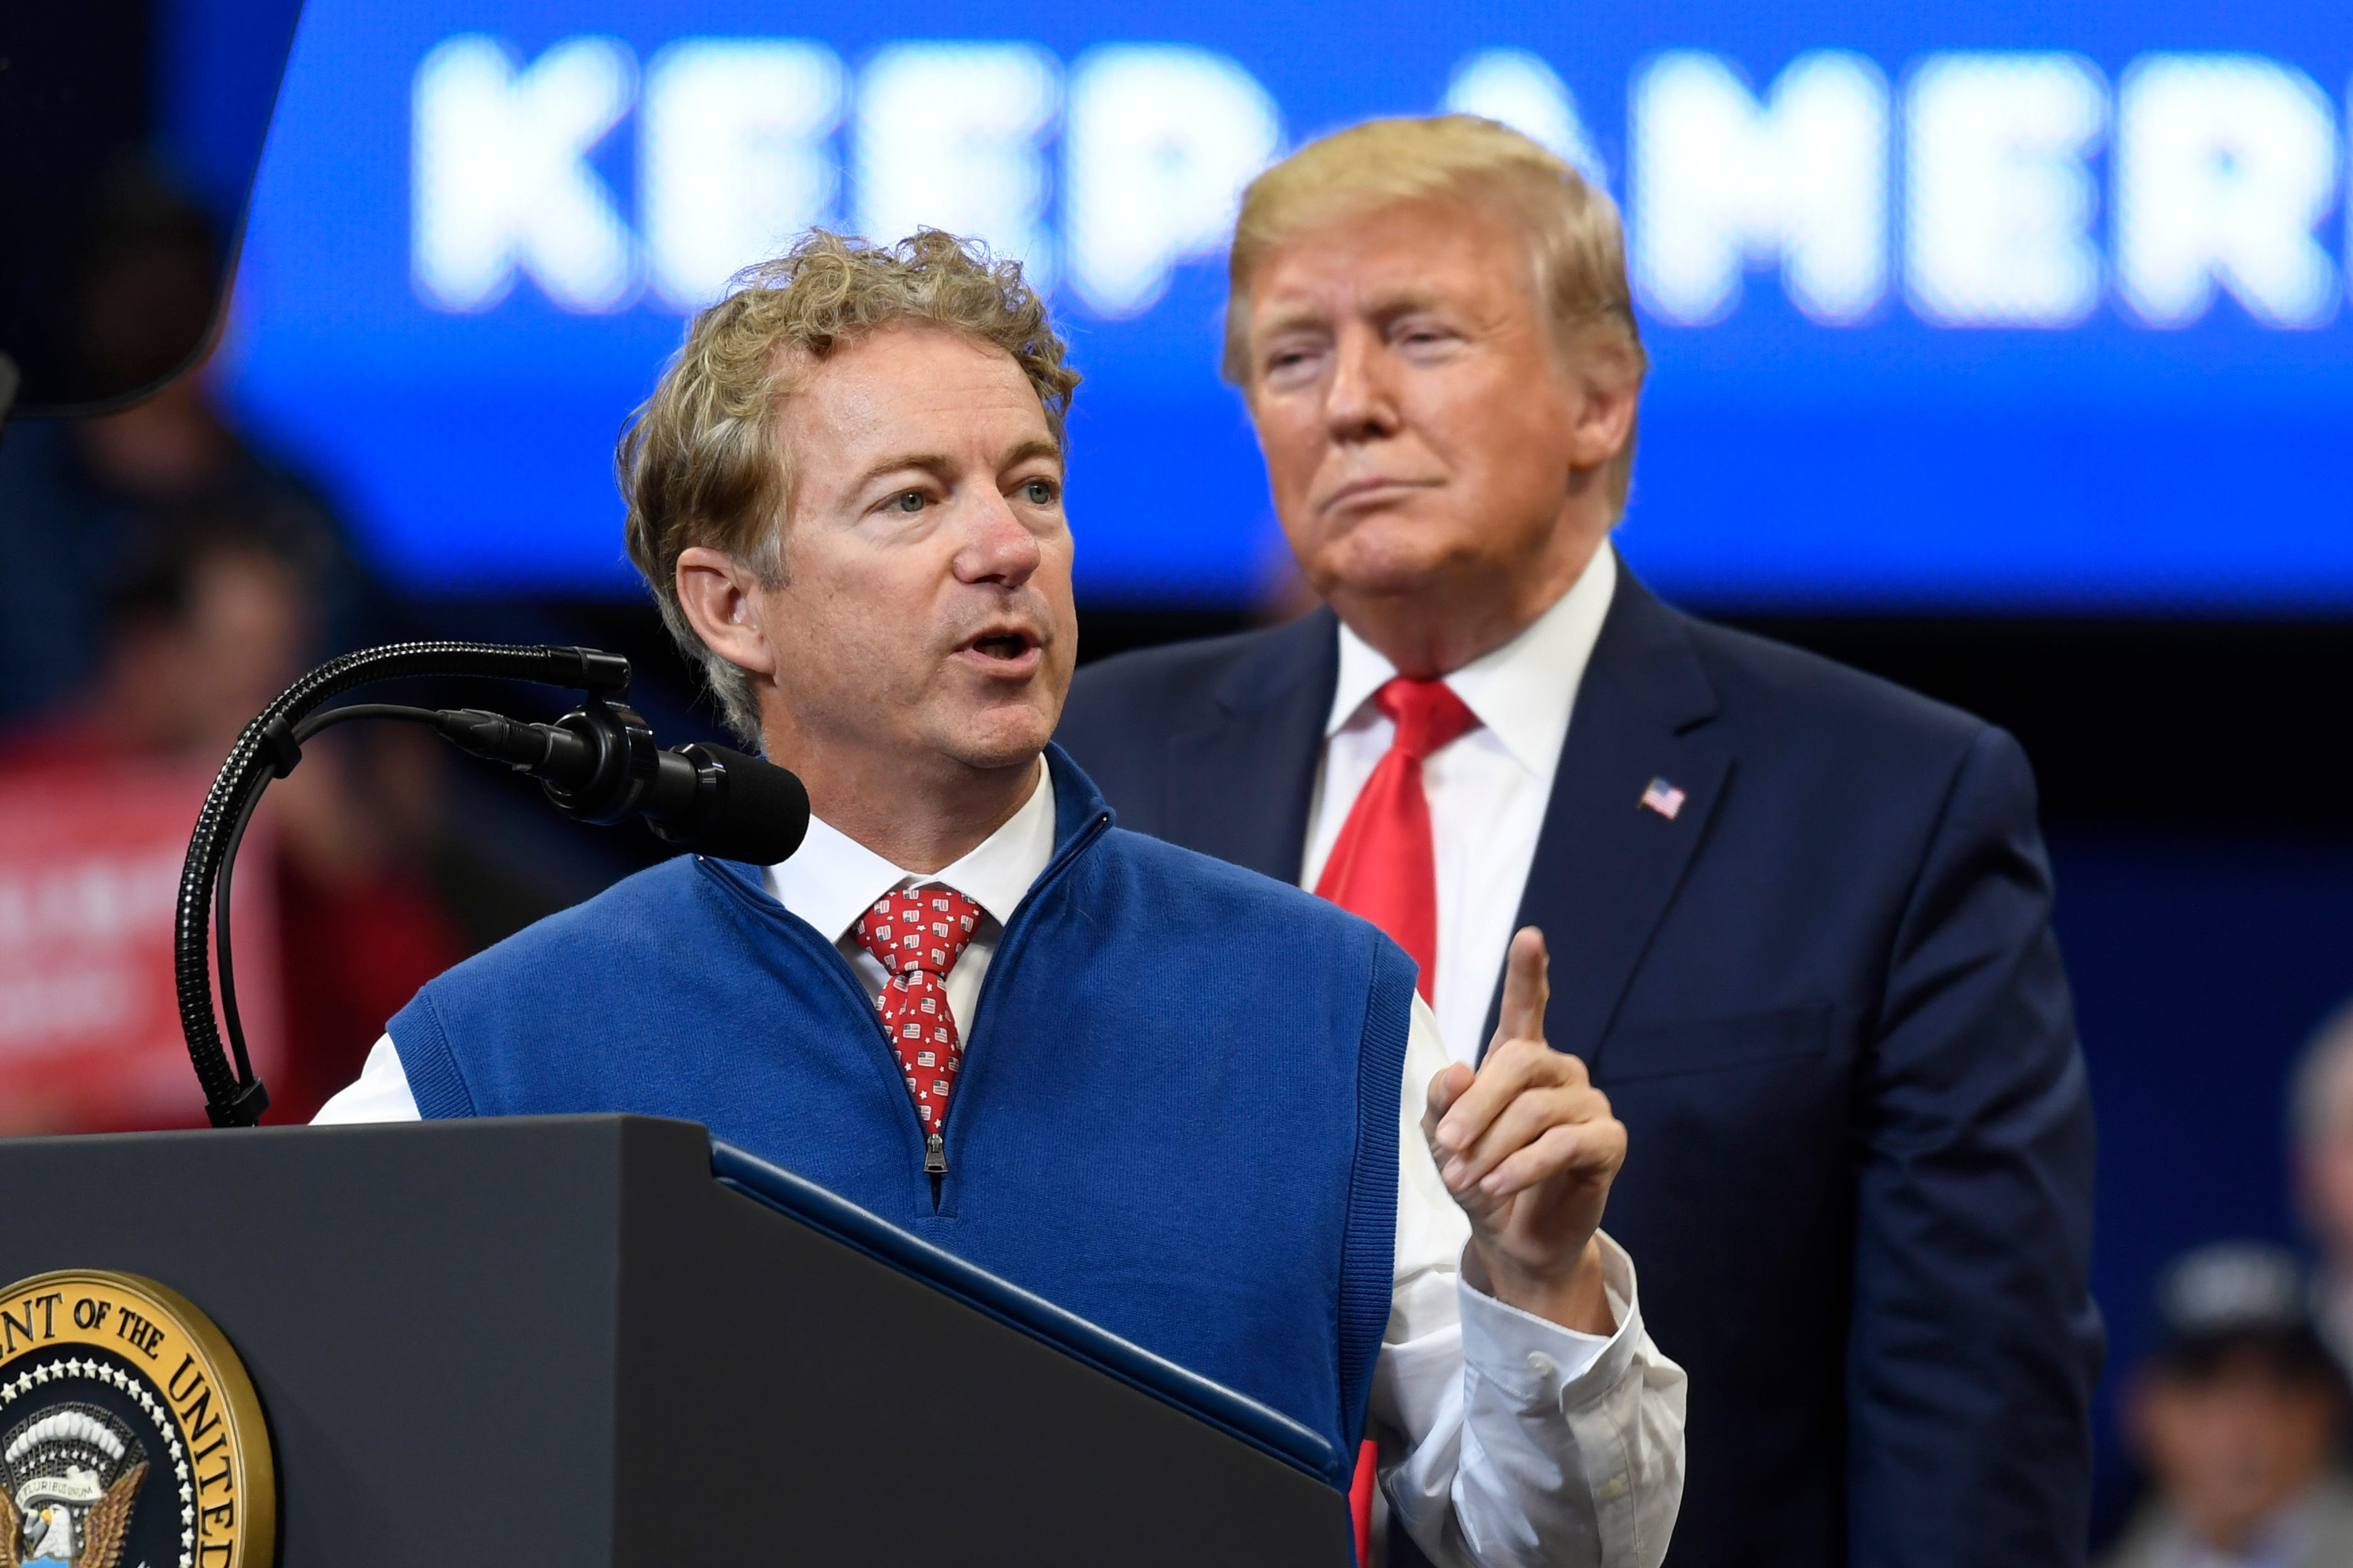 Do your job! : Kentucky Sen. Rand Paul demands media reveal whistleblower s identity